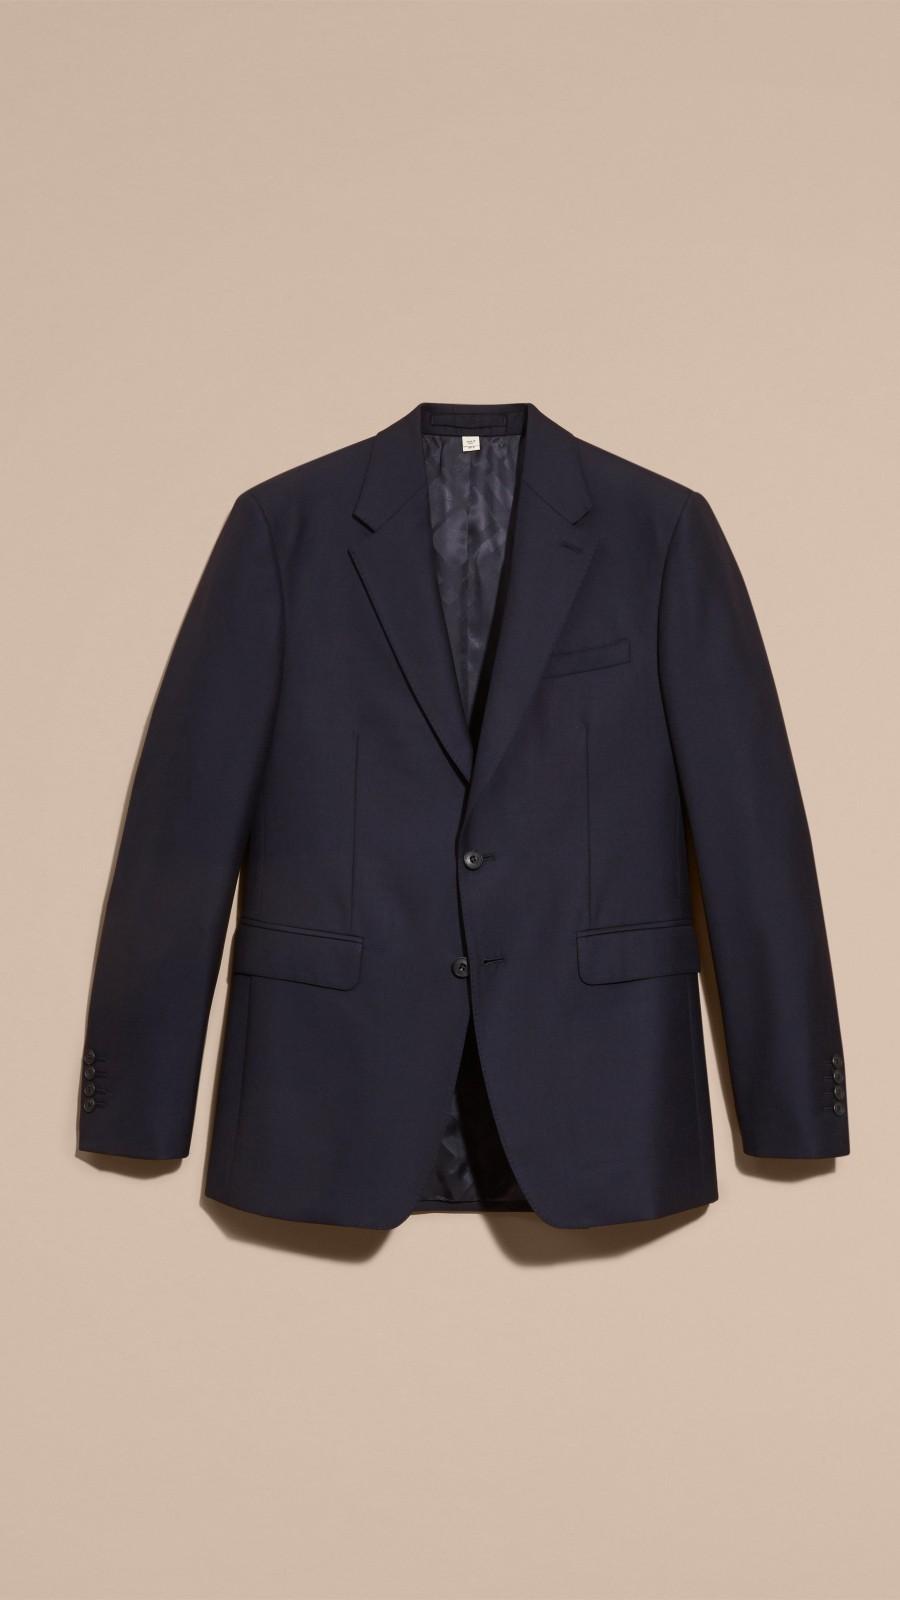 Navy Classic Fit Wool Part-canvas Suit Navy - Image 4